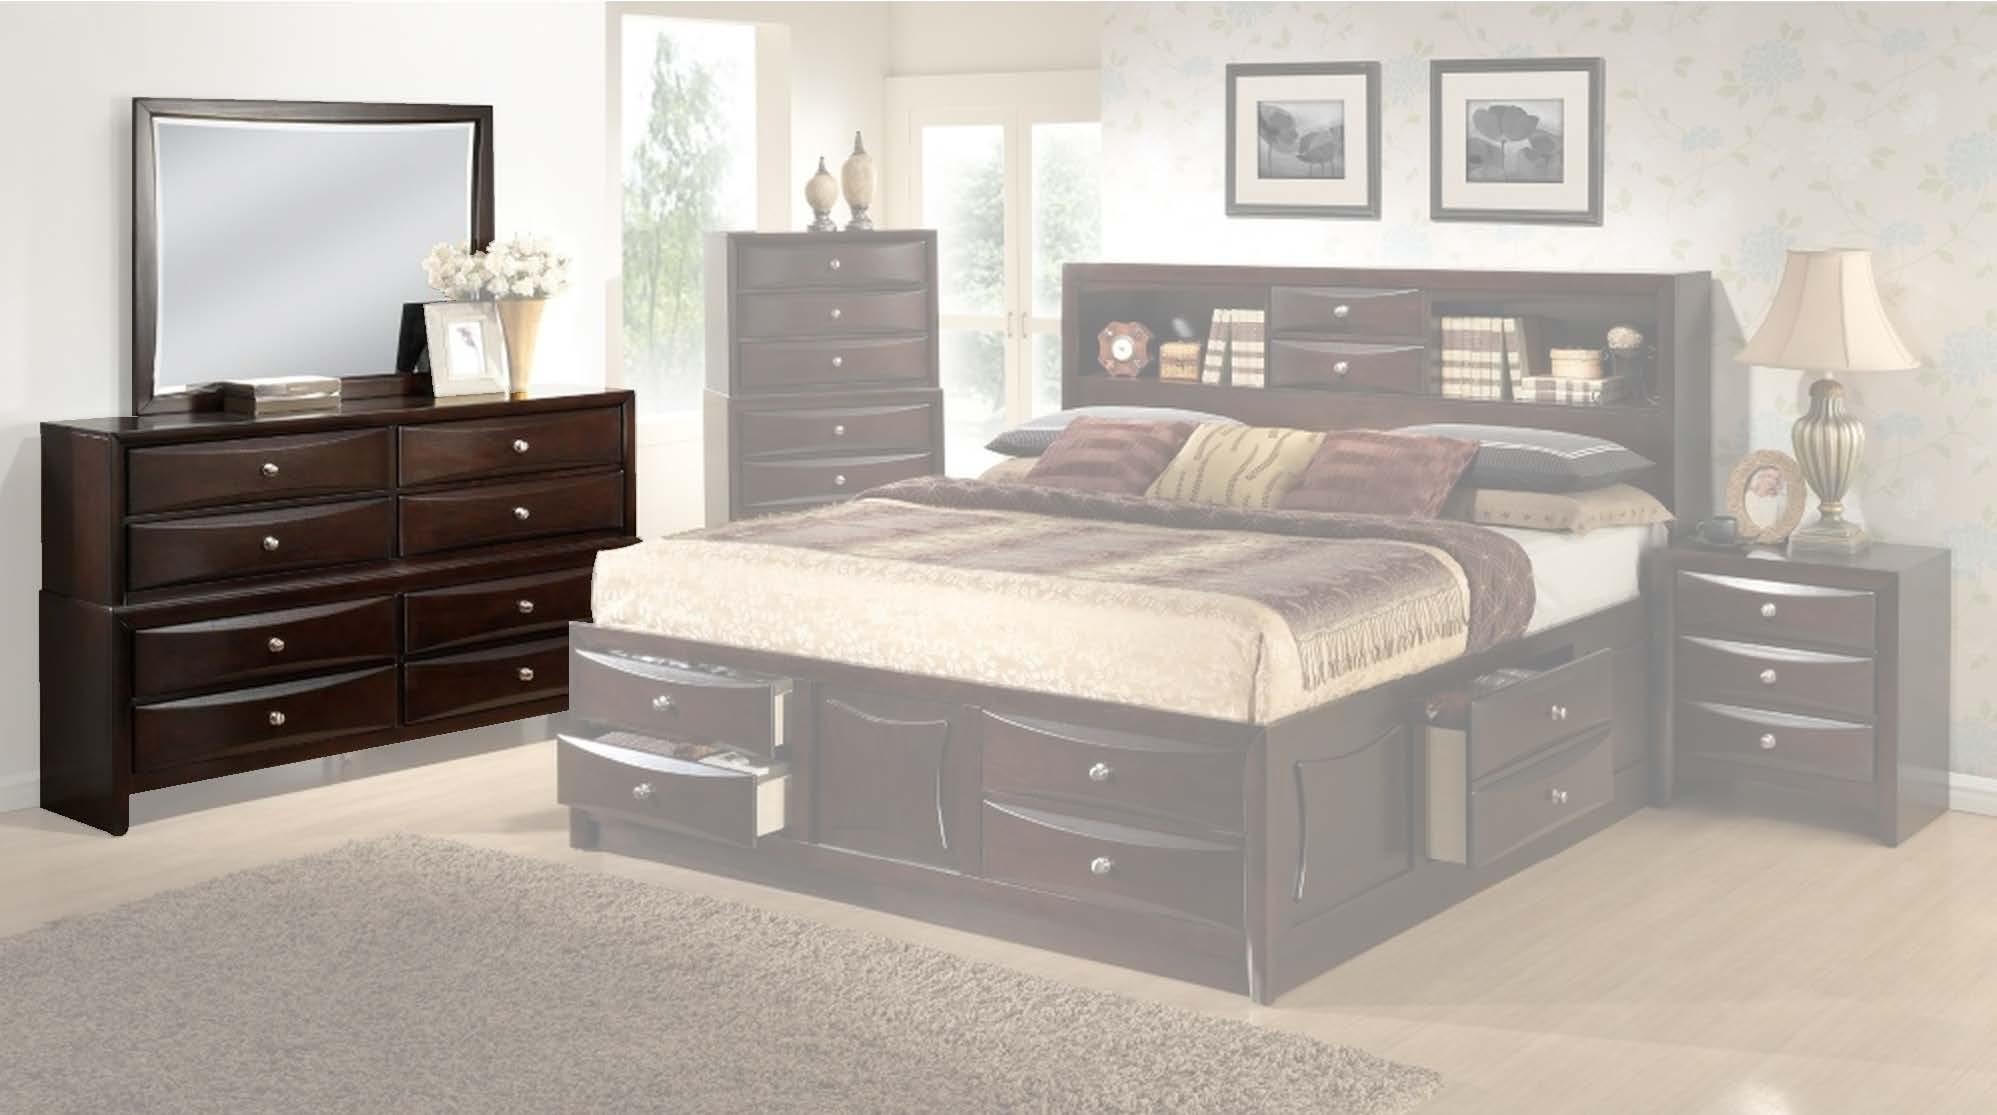 hfb2.furniturecore.com - /UNCONTROLLED/Manufacturer Source Images ...